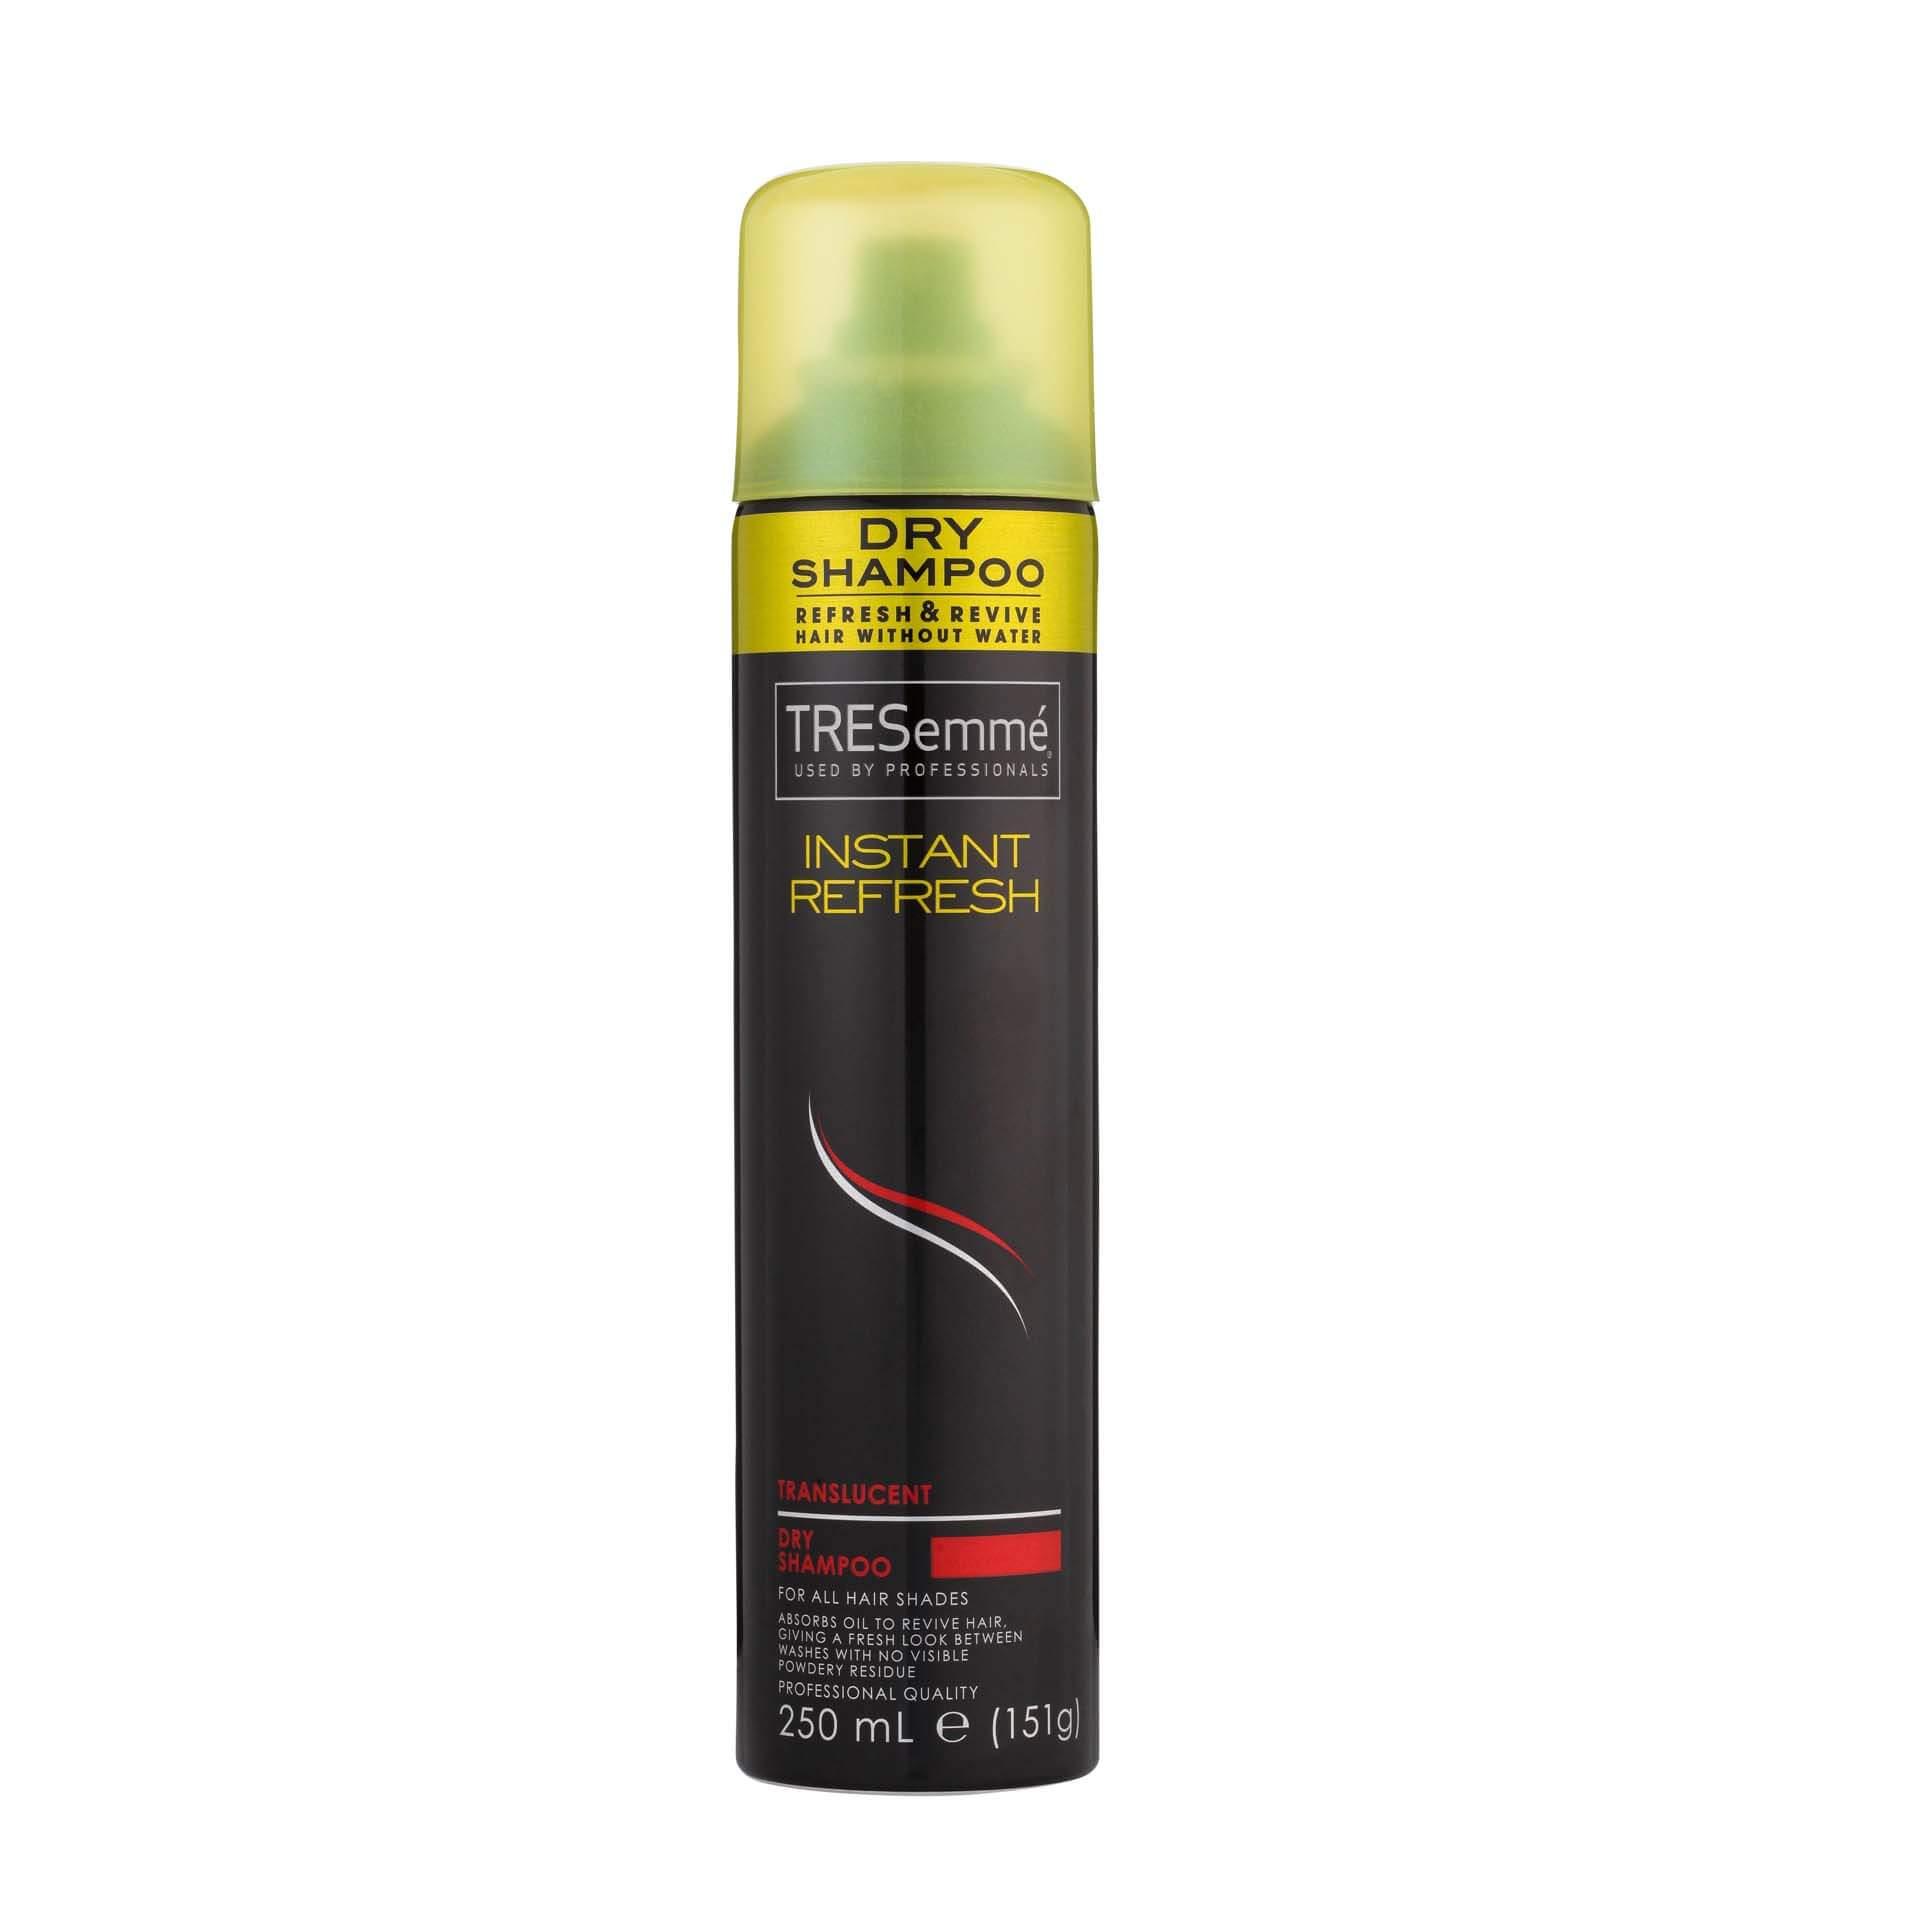 TRESemmé Instant Refresh Translucent Dry Shampoo